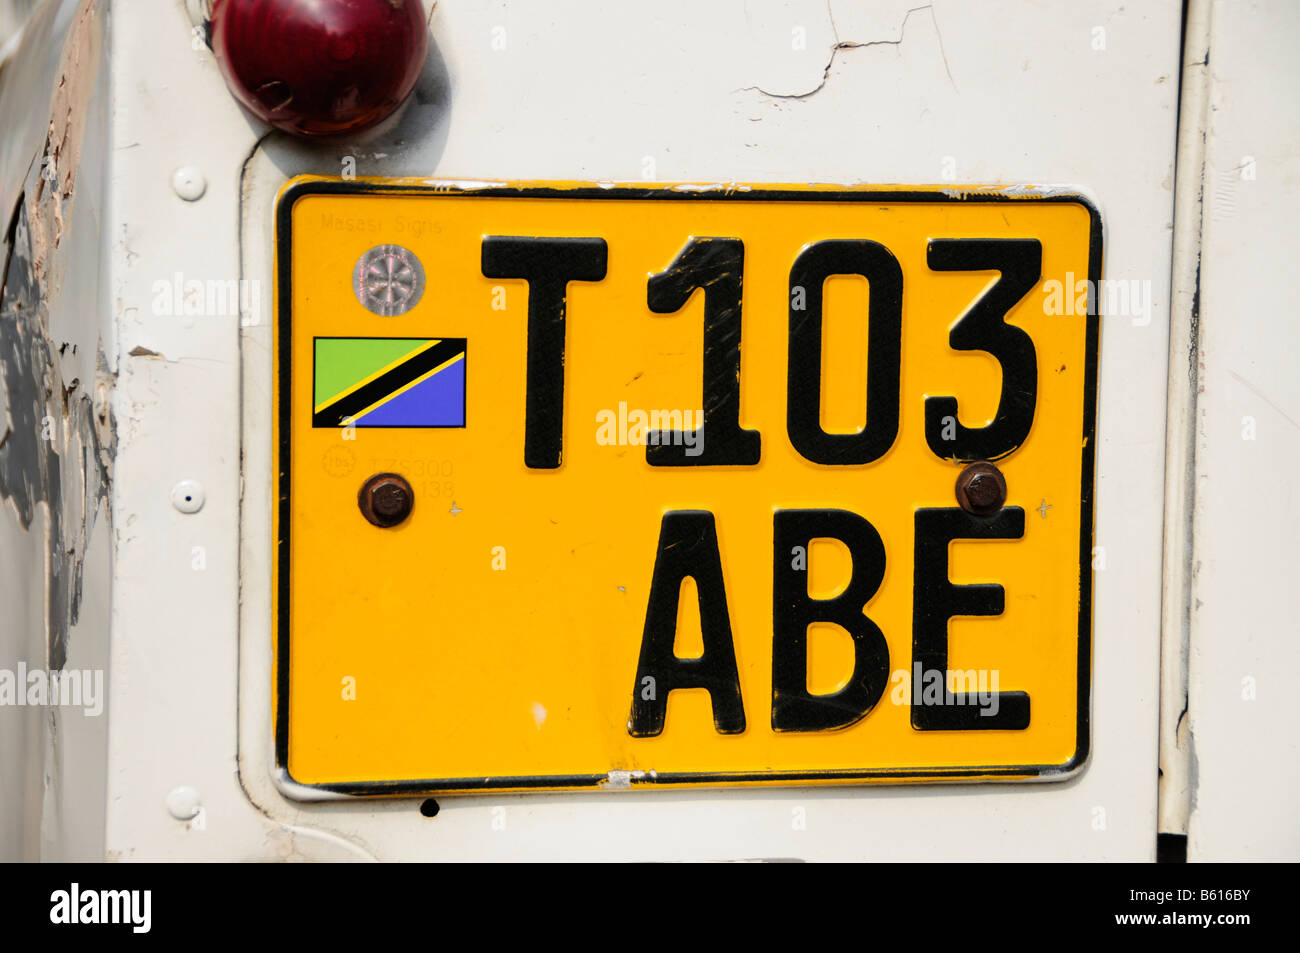 Tanzanian number plate on a car, Arusha, Tanzania, Africa - Stock Image